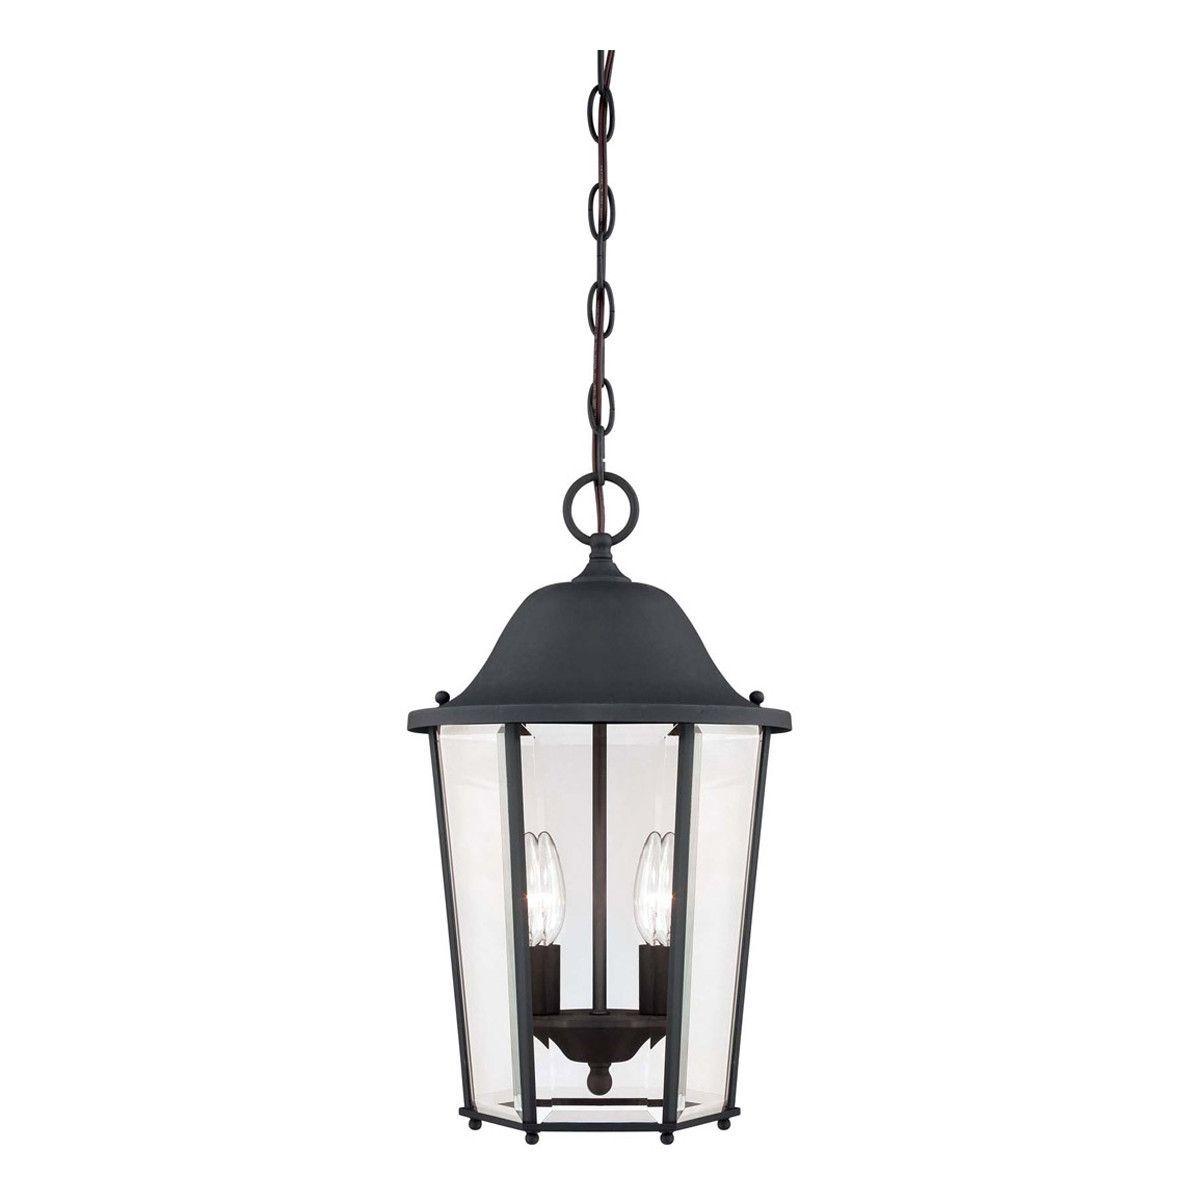 Truscott 2-Light Hanging Lantern